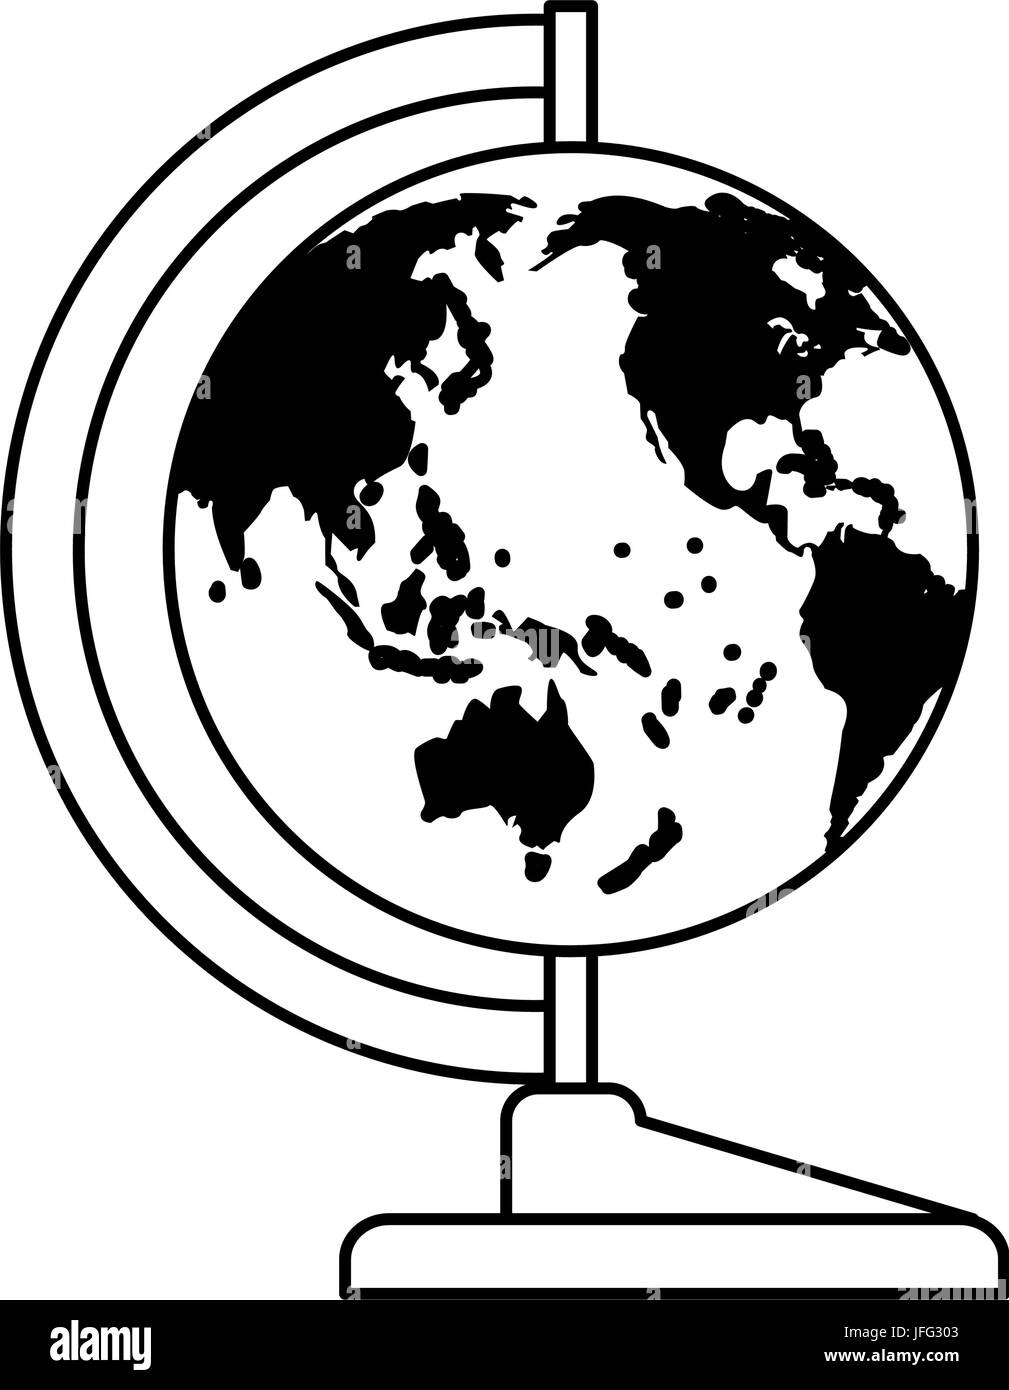 Weltkarte Lehren Zubehör Stockbild